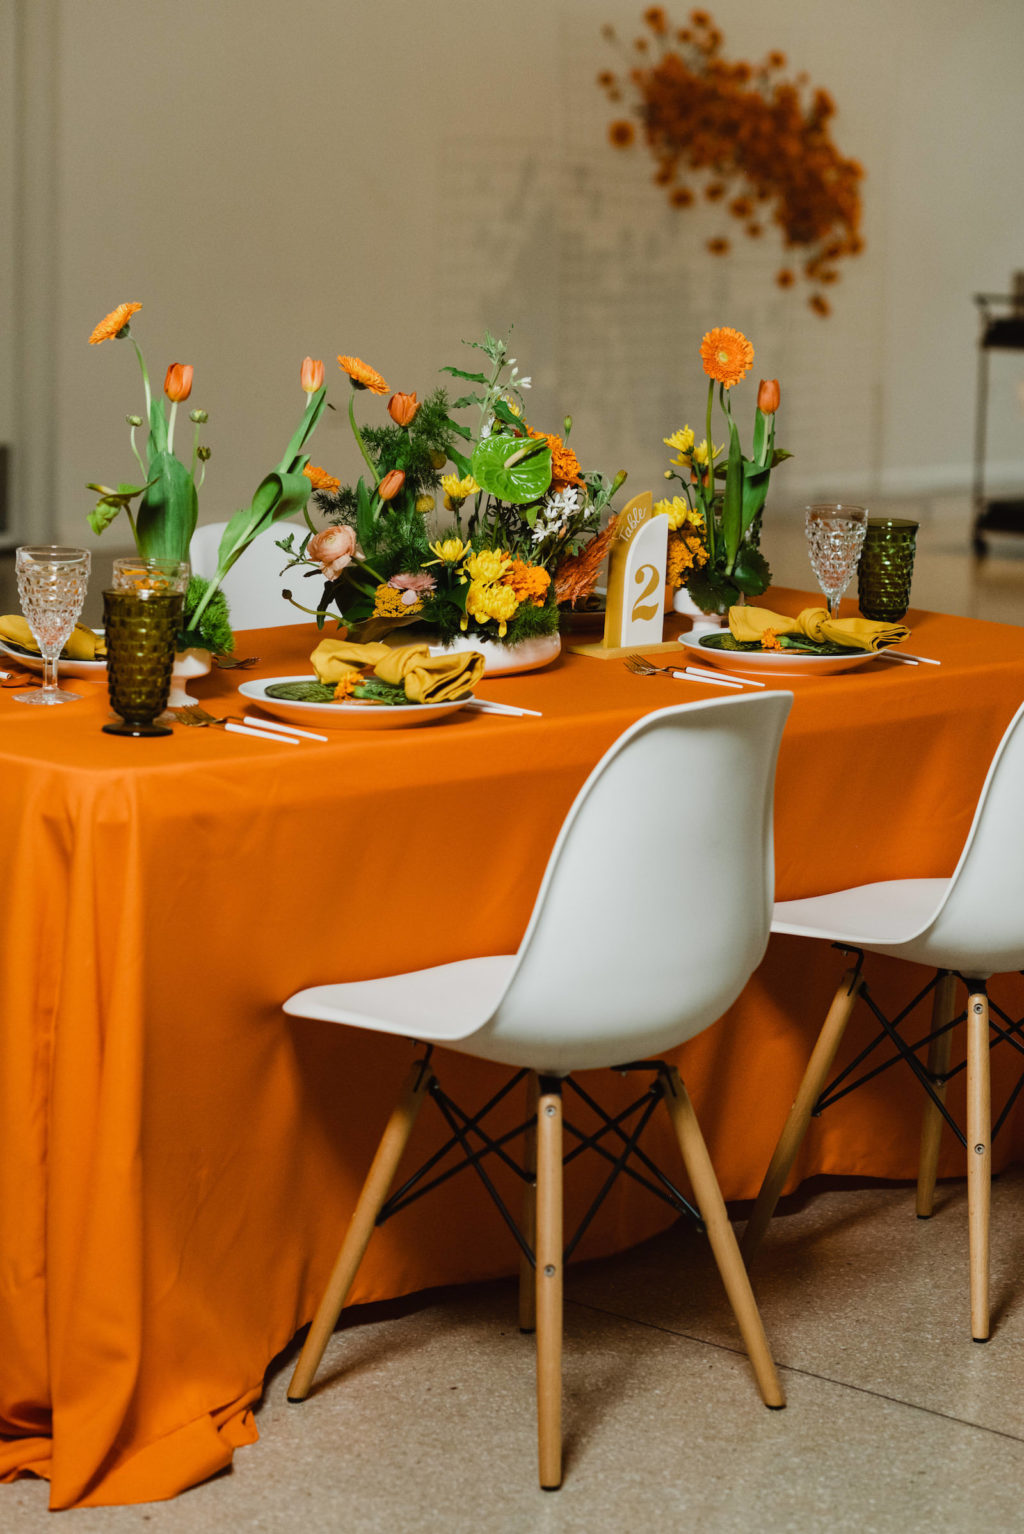 Retro Eclectic Wedding Reception Decor, Long Table with Orange Tablecloth, White Eames Chairs, Vibrant Floral Centerpieces | Wedding Venue Tampa Garden Club